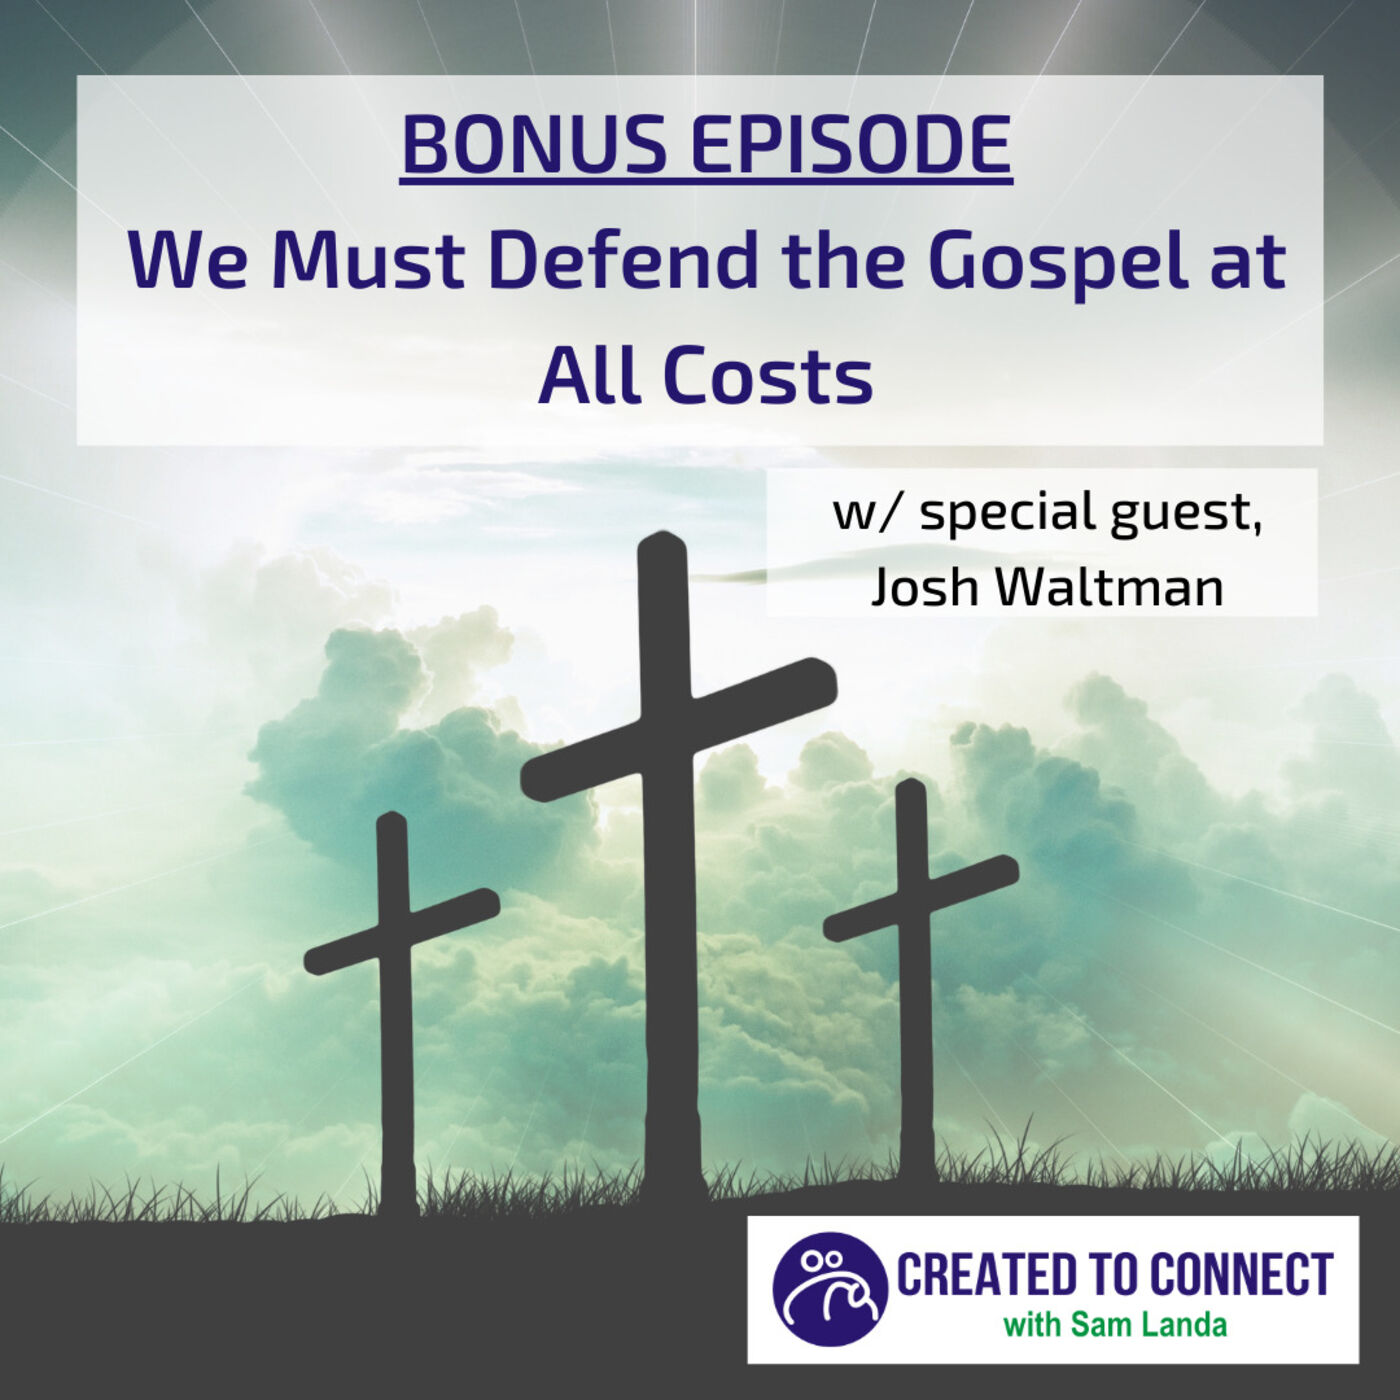 Ep. 24 - BONUS Episode: We Must Defend the Gospel at All Costs